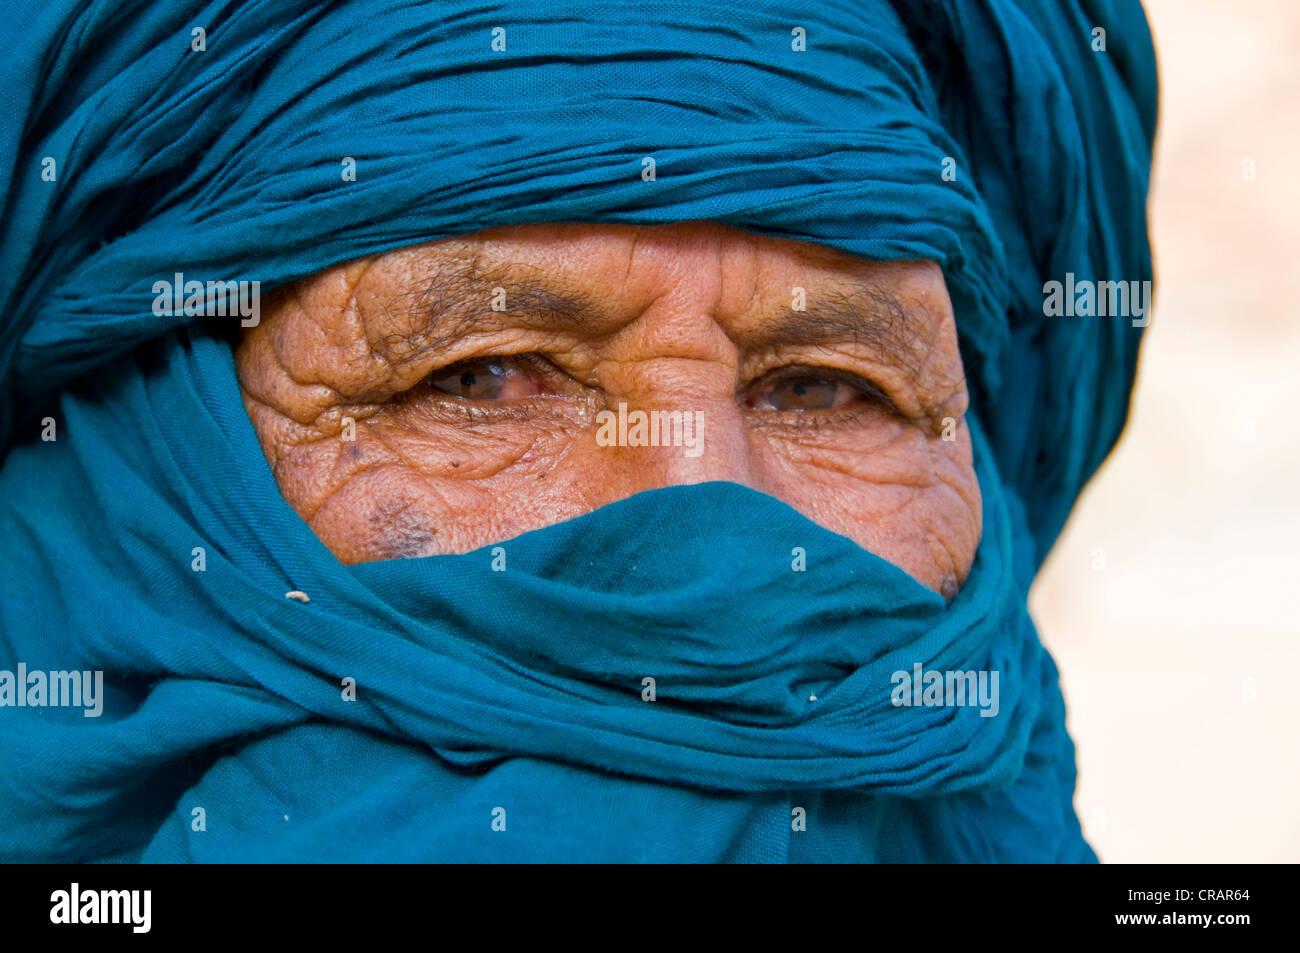 Hombre Tuareg, retrato, Essendilene, Argelia, África Imagen De Stock